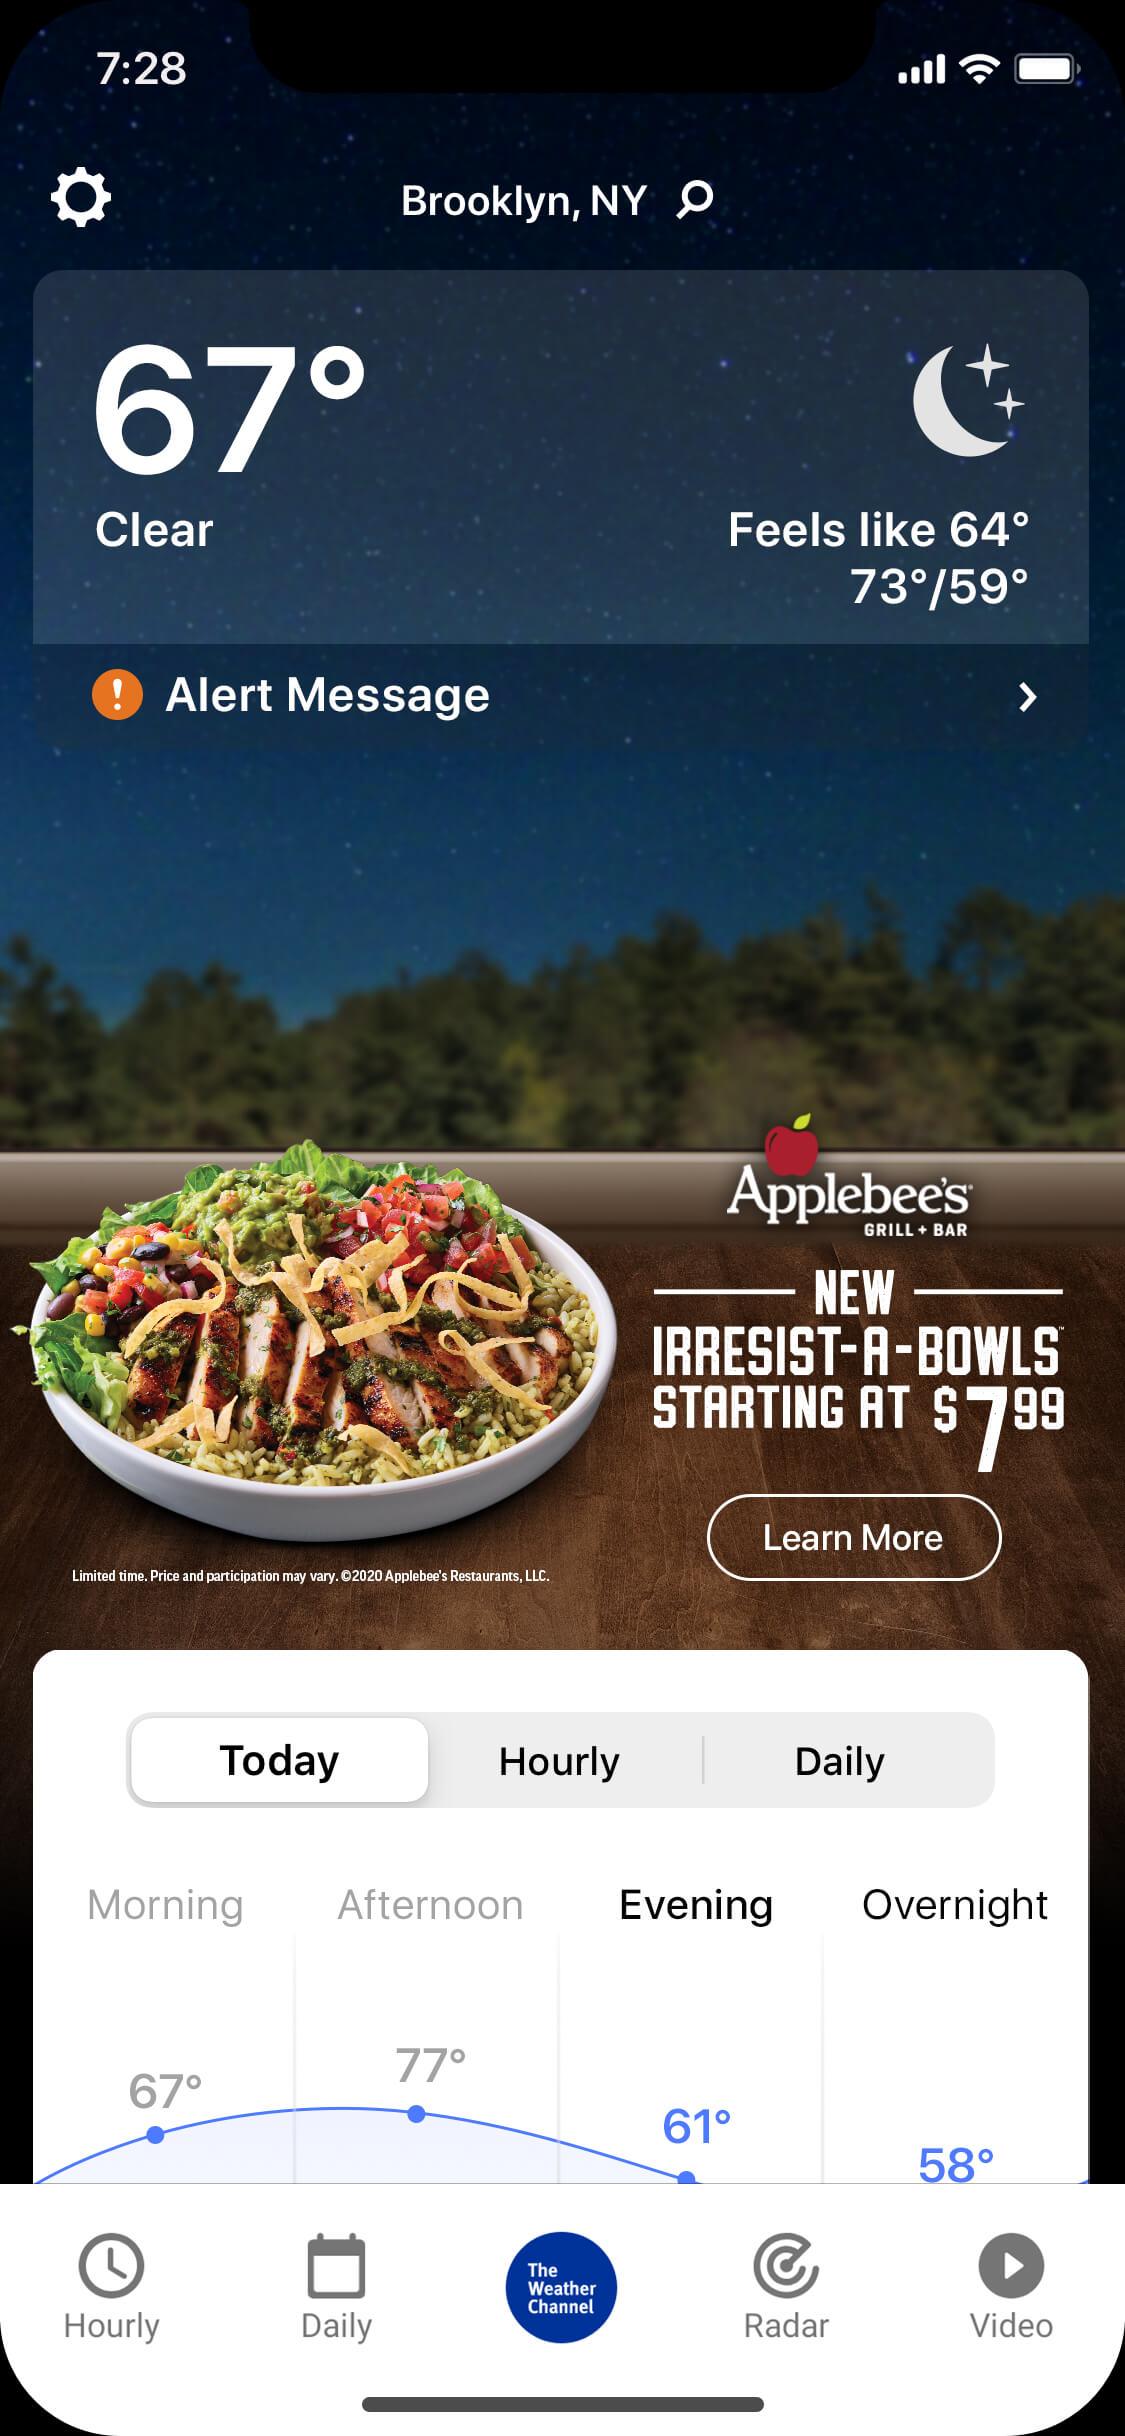 applebees-bowls-im_clear-night